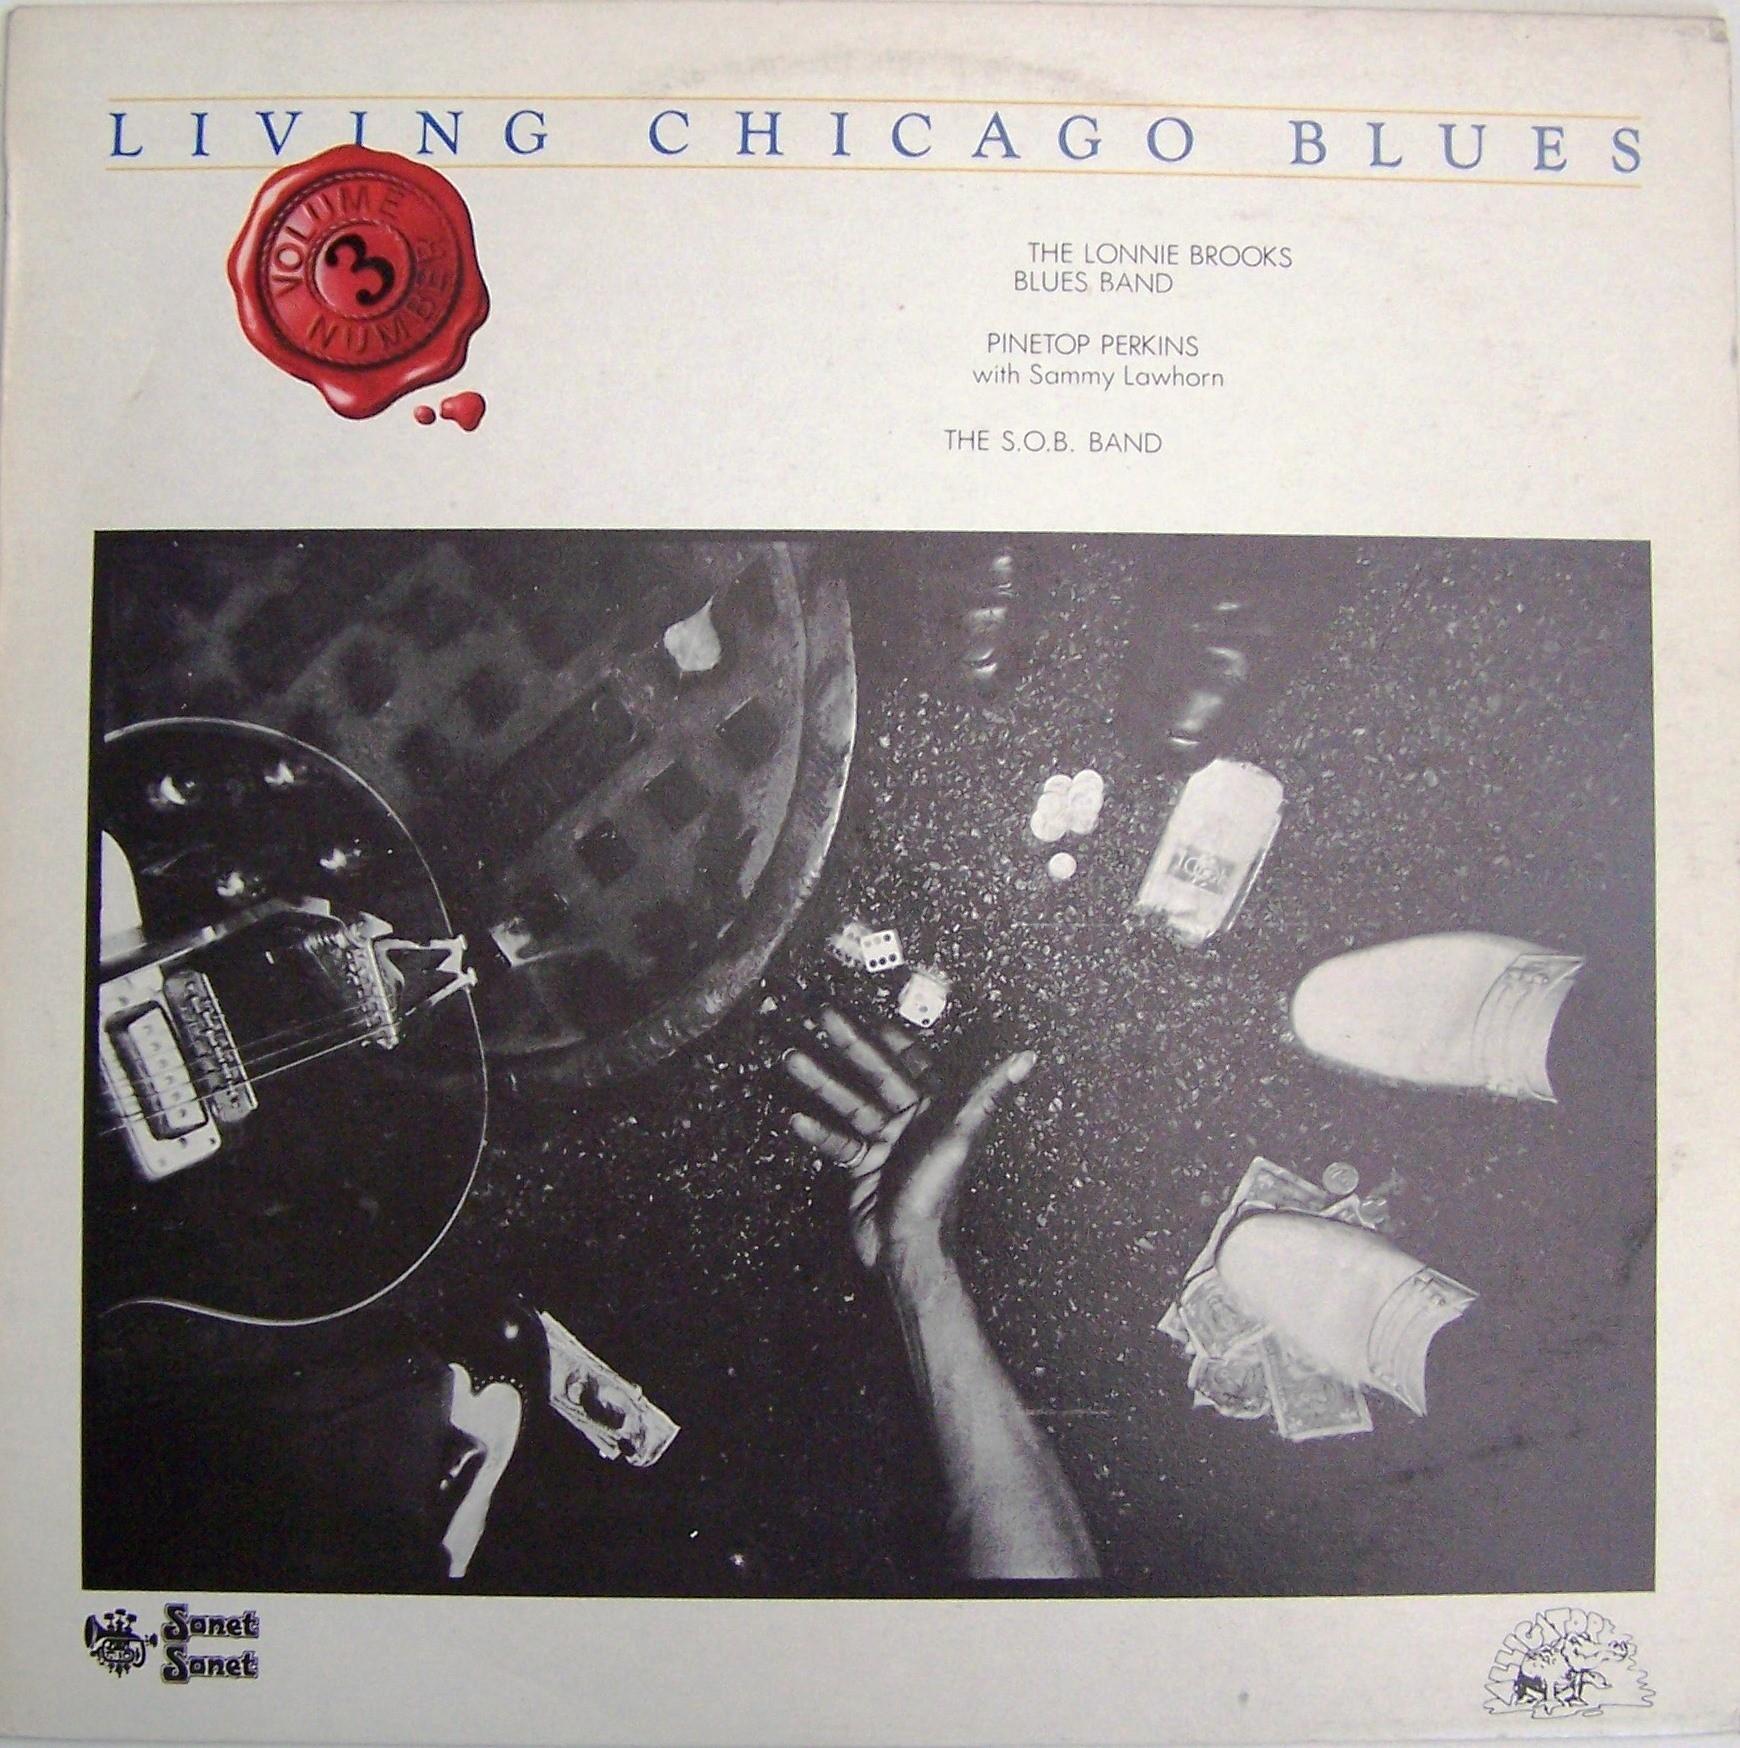 Various Artists - Living Chicago Blues Vol 3 Lonnie Brooks Band/pinetop Perkins/sob Band